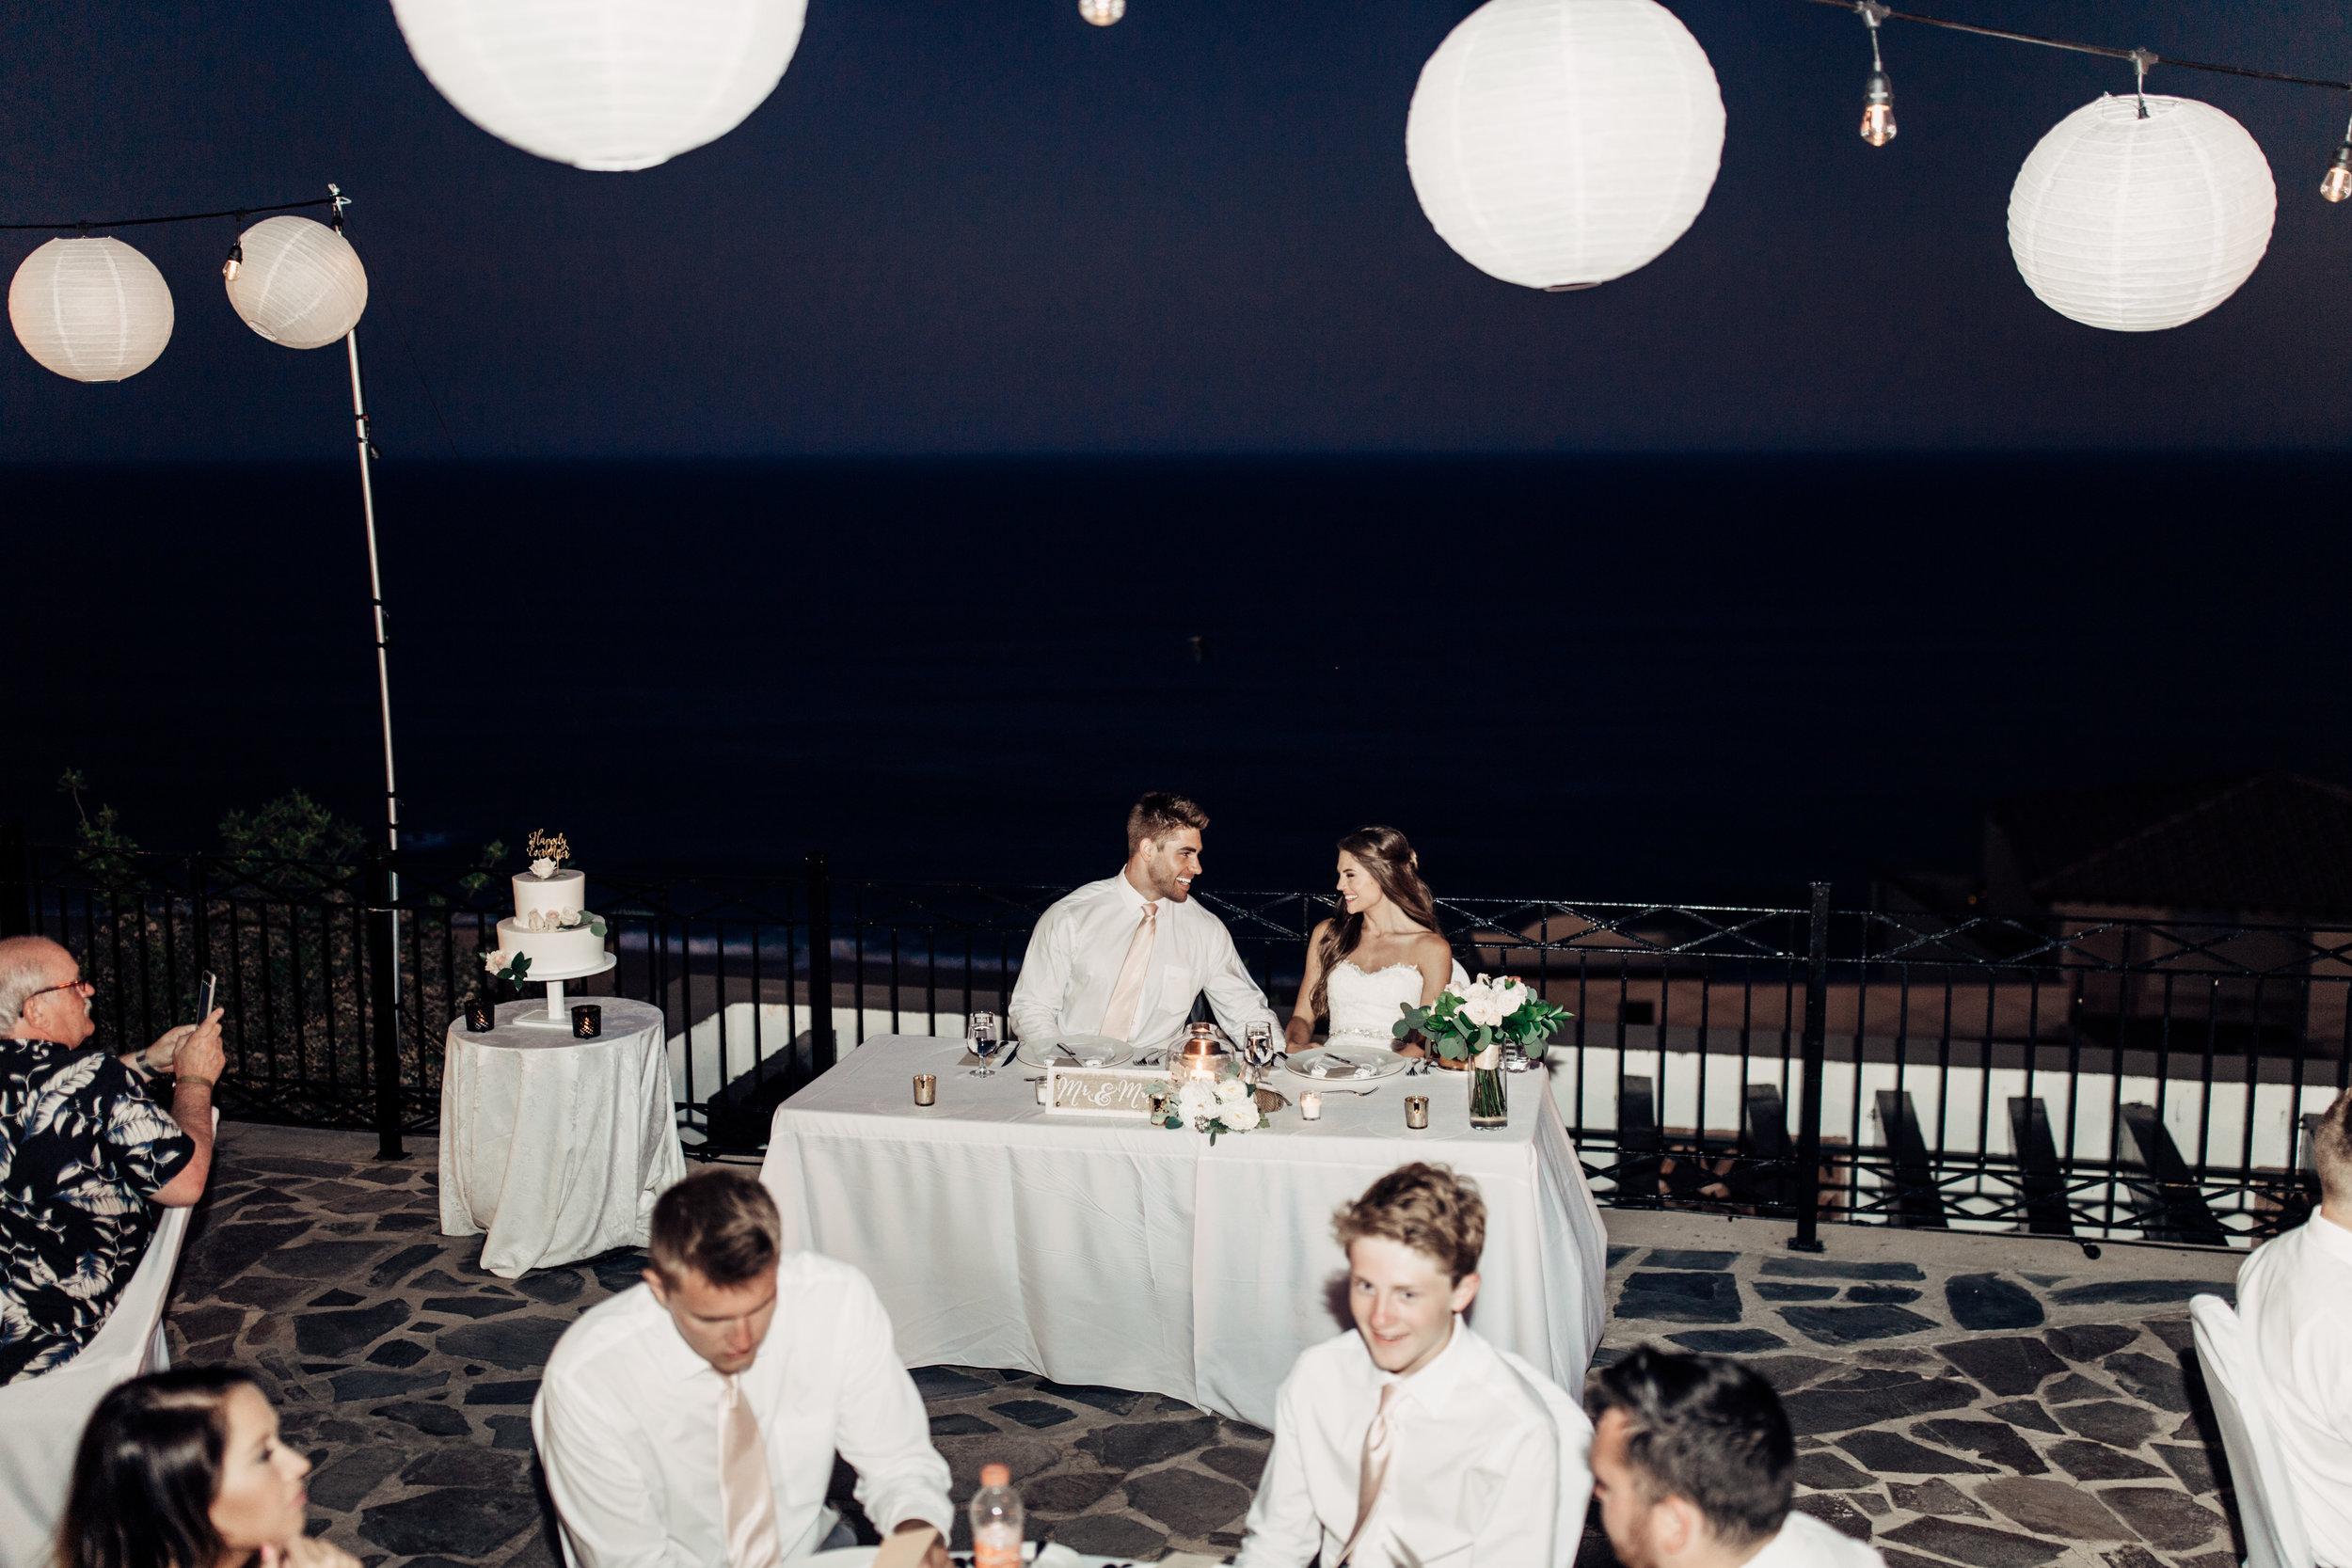 pueblo-bonito-sunset-beach-wedding-cabo-san-lucas640.jpg